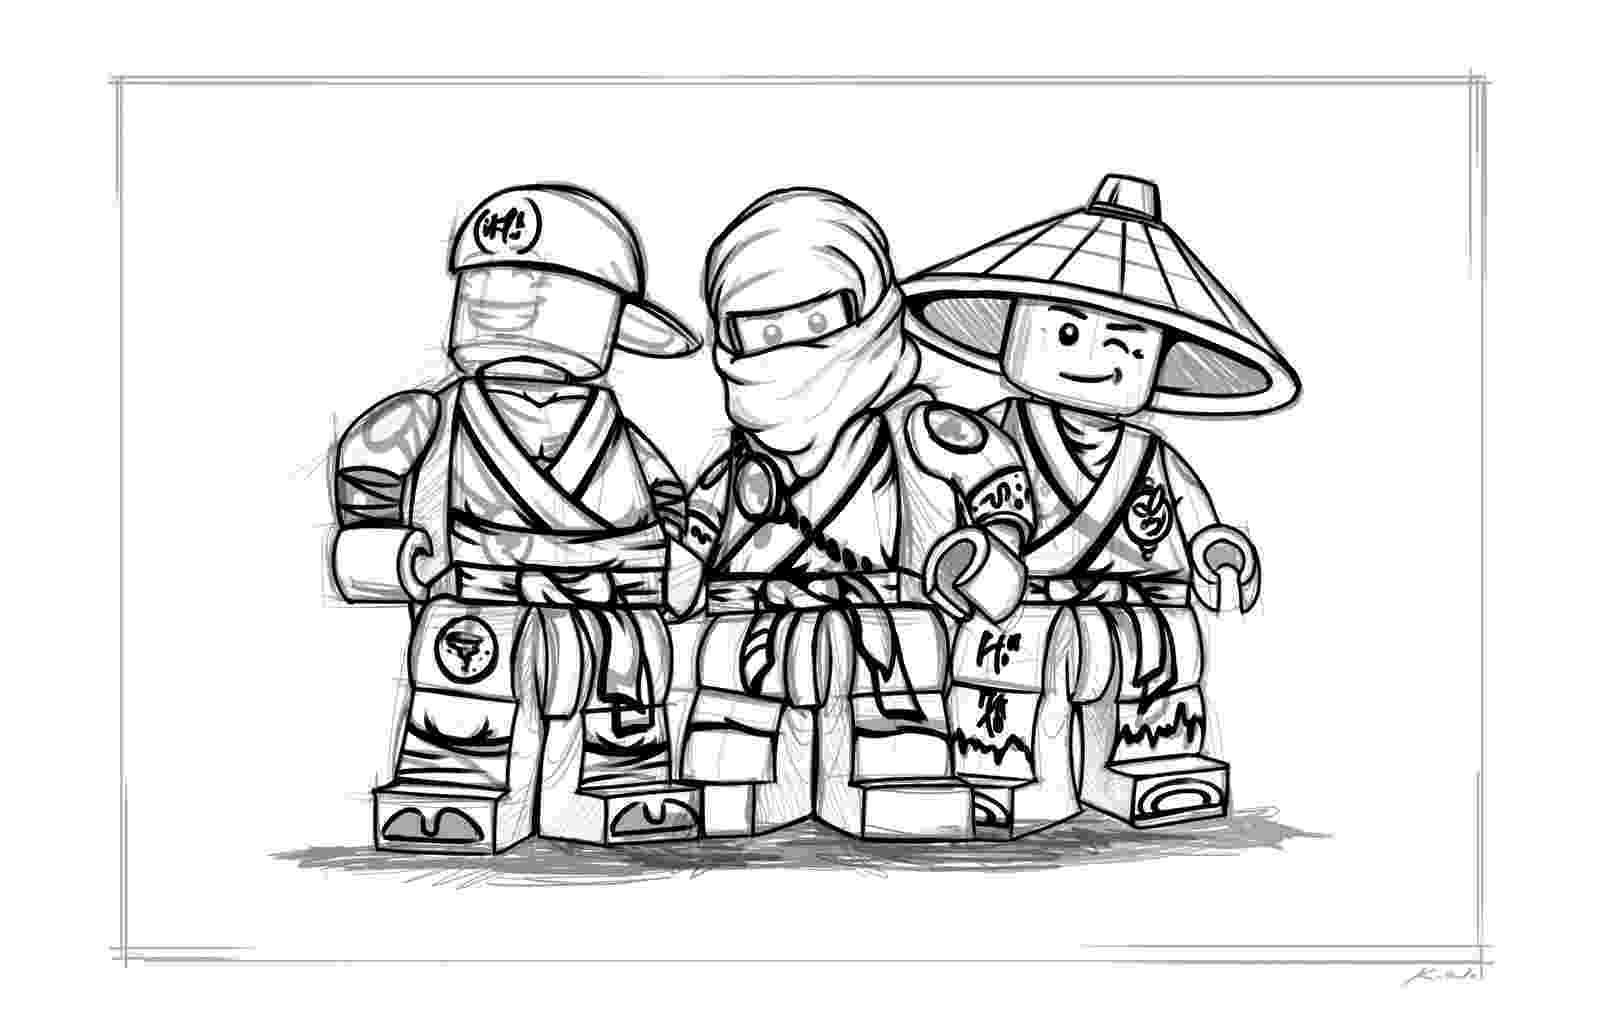 pictures of lego ninjago lego ninjago coloring pages fantasy coloring pages lego ninjago of pictures